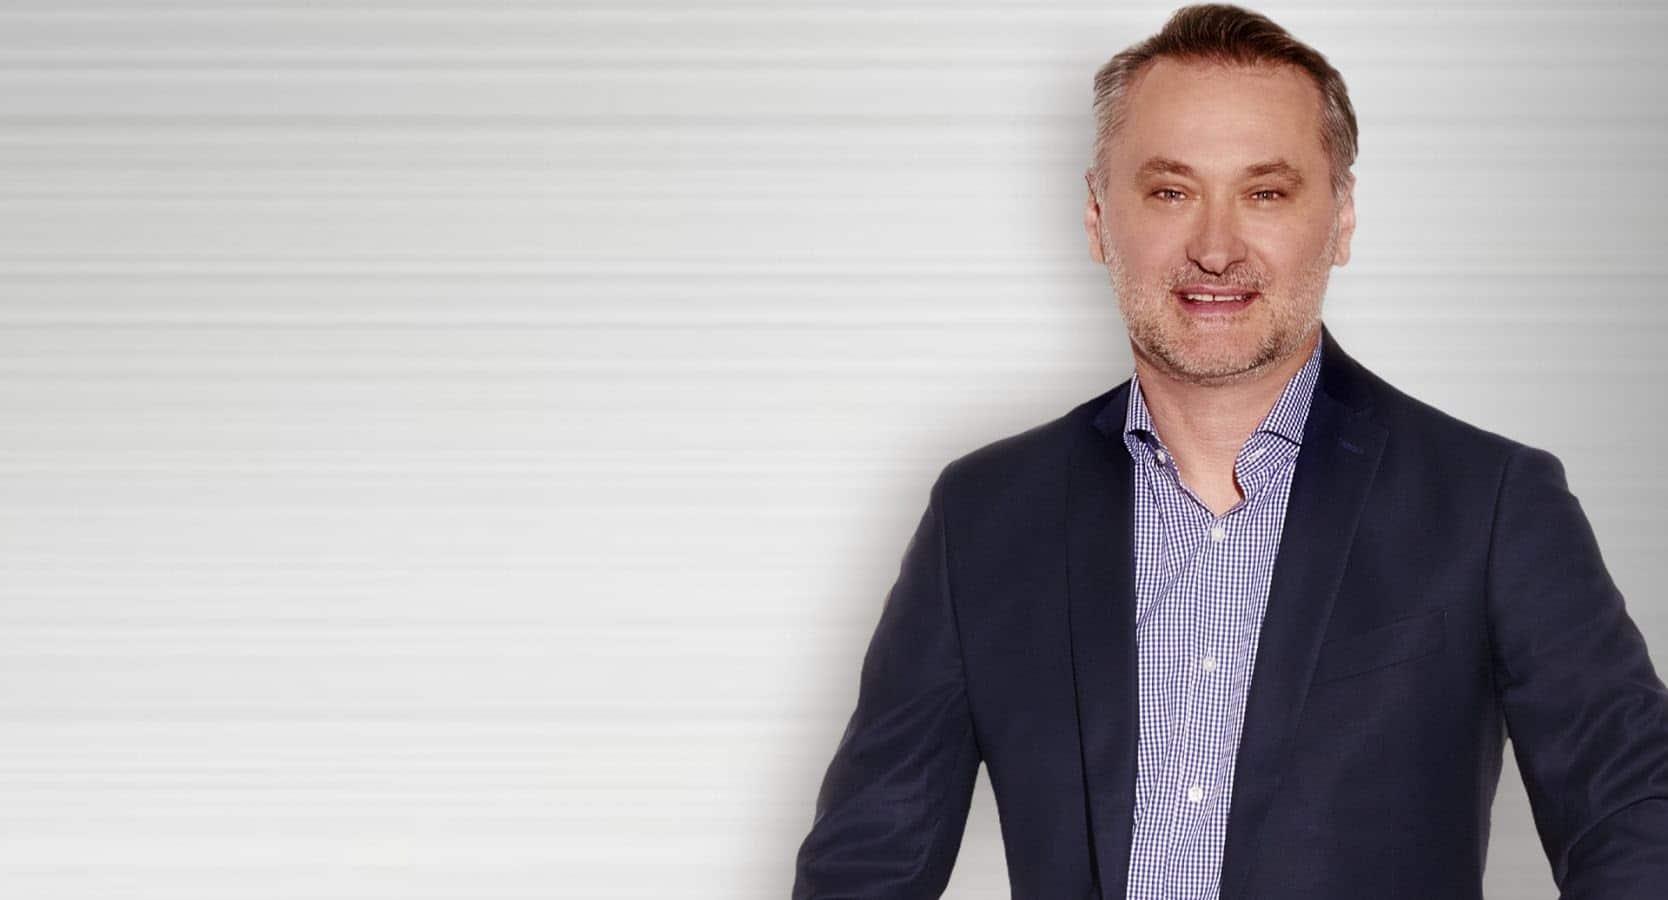 unnamed 1 Ο πρώην VP της Alexa Automotive, επικεφαλής Τεχνολογίας της Stellantis Stellantis, ειδήσεις, Νέα